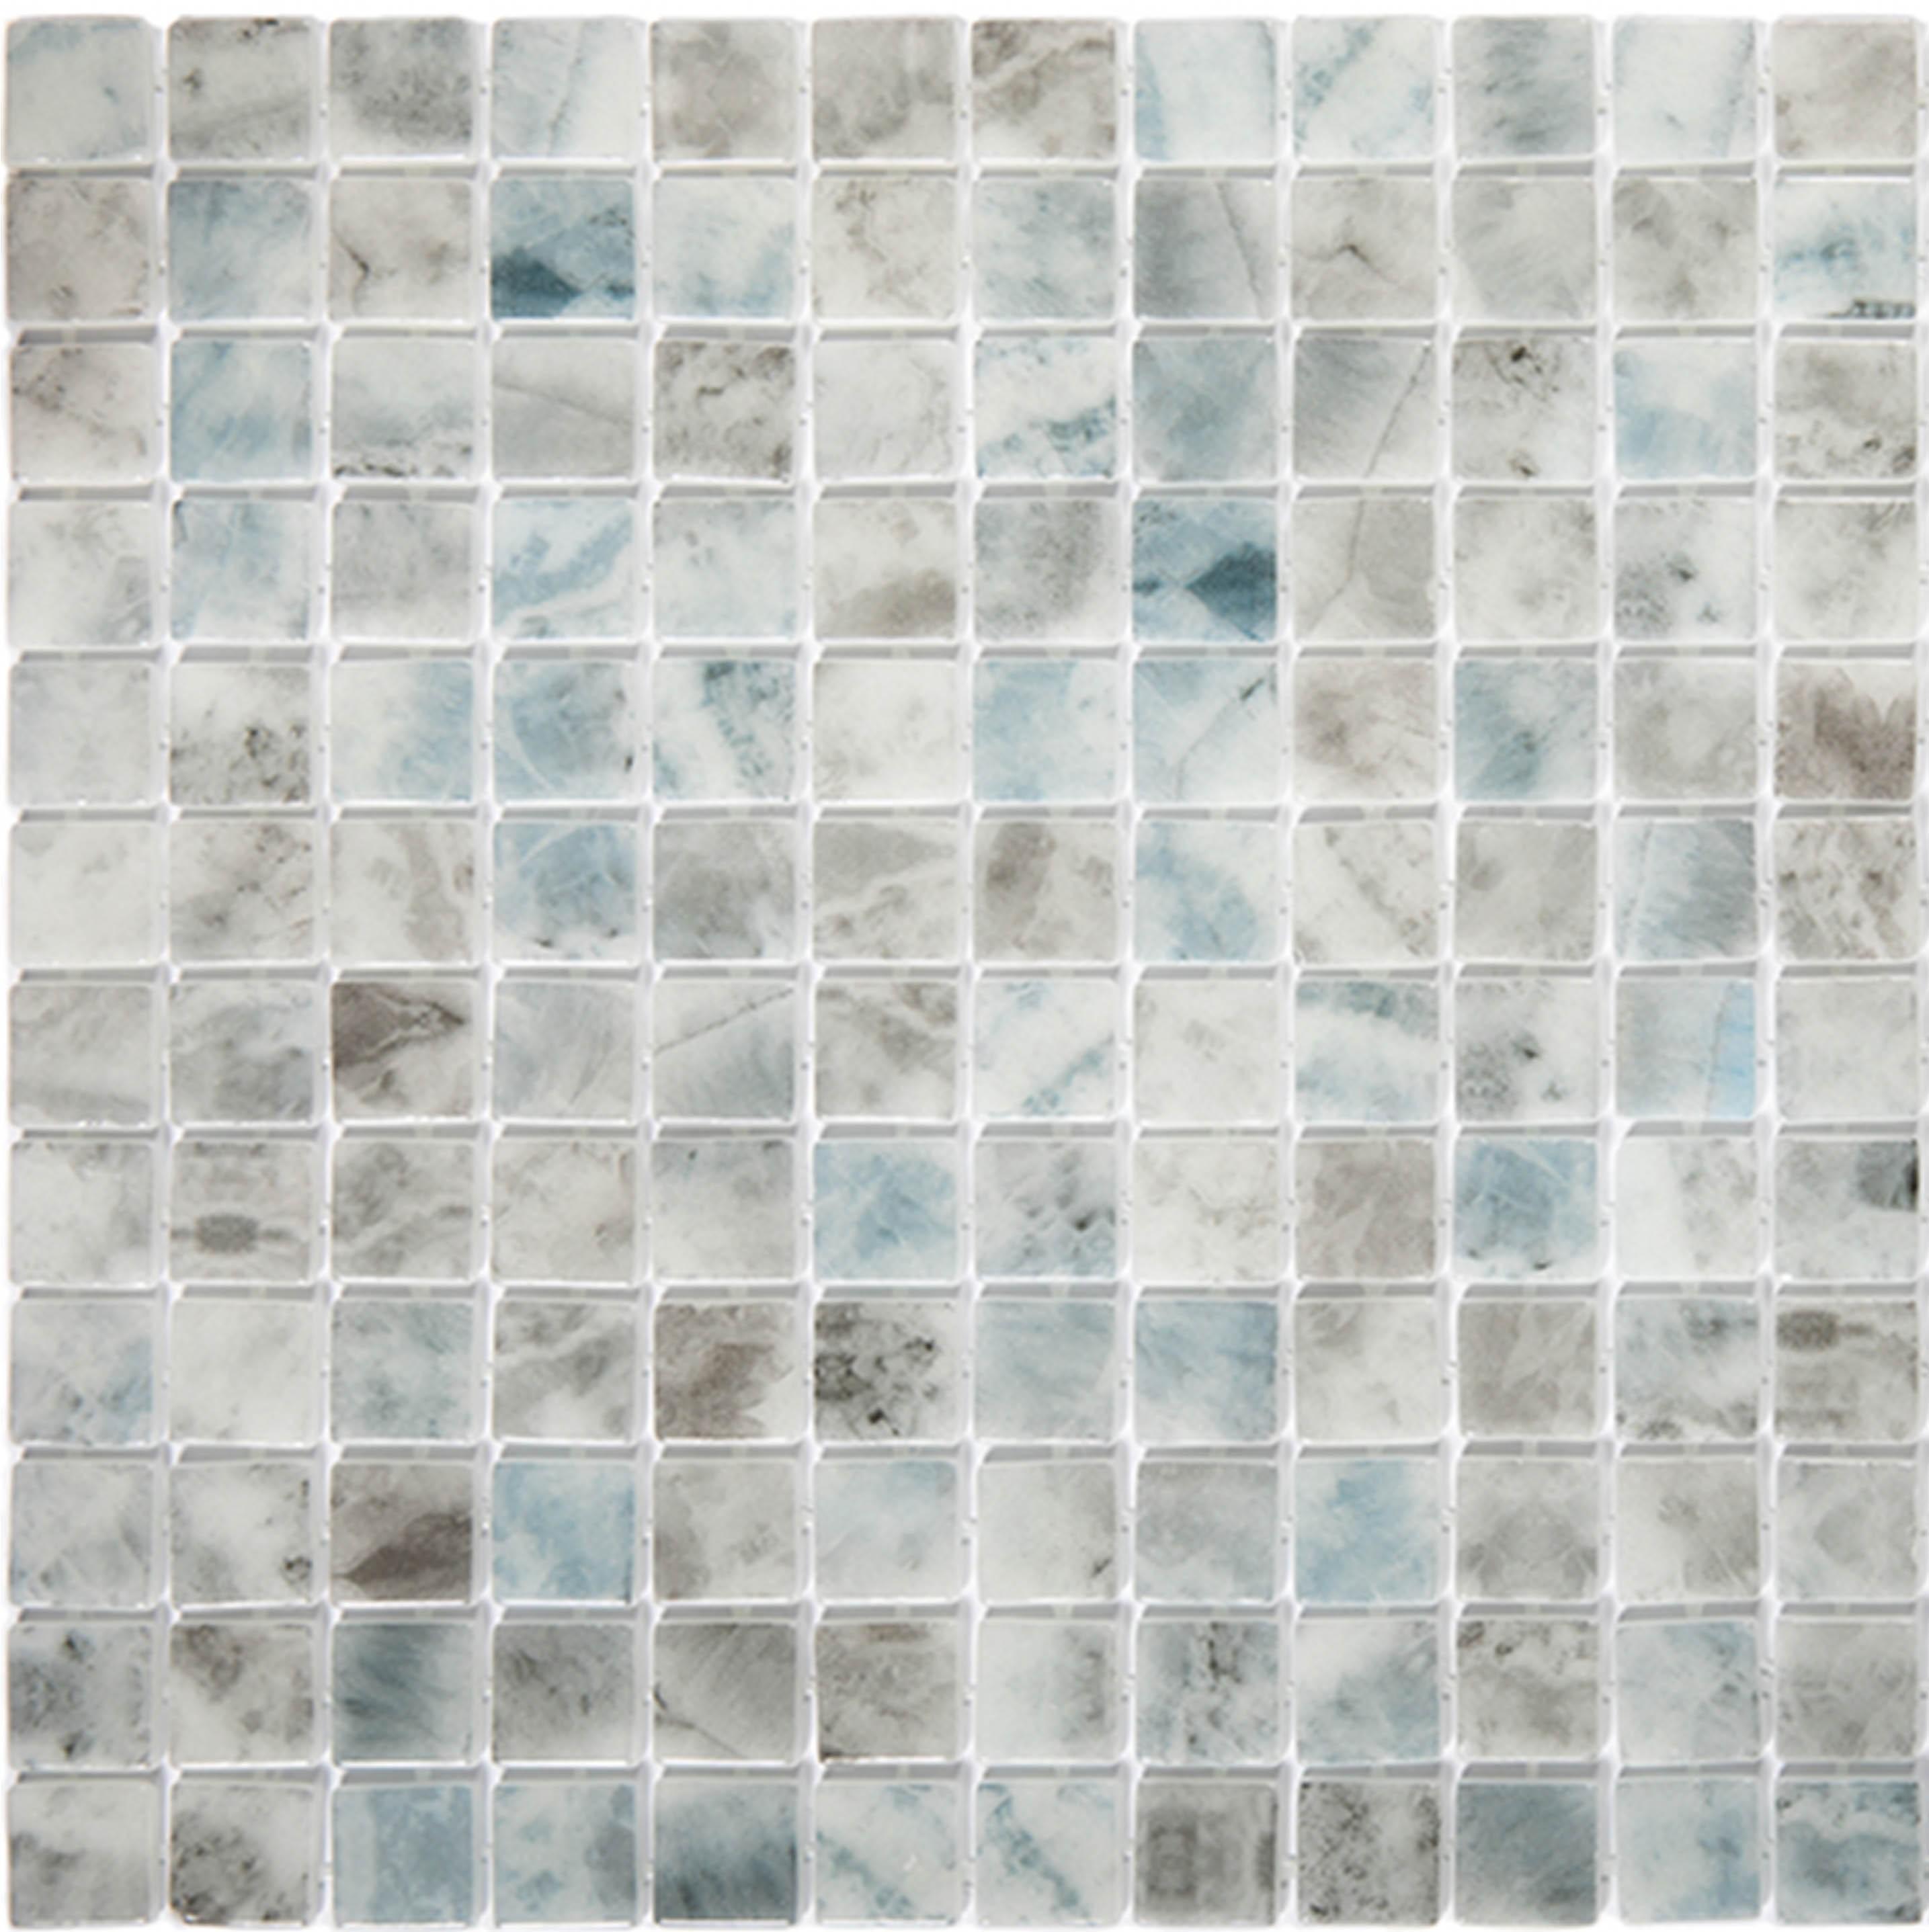 Pool-Tiles Hero Onix Shore-hero-gallery-2